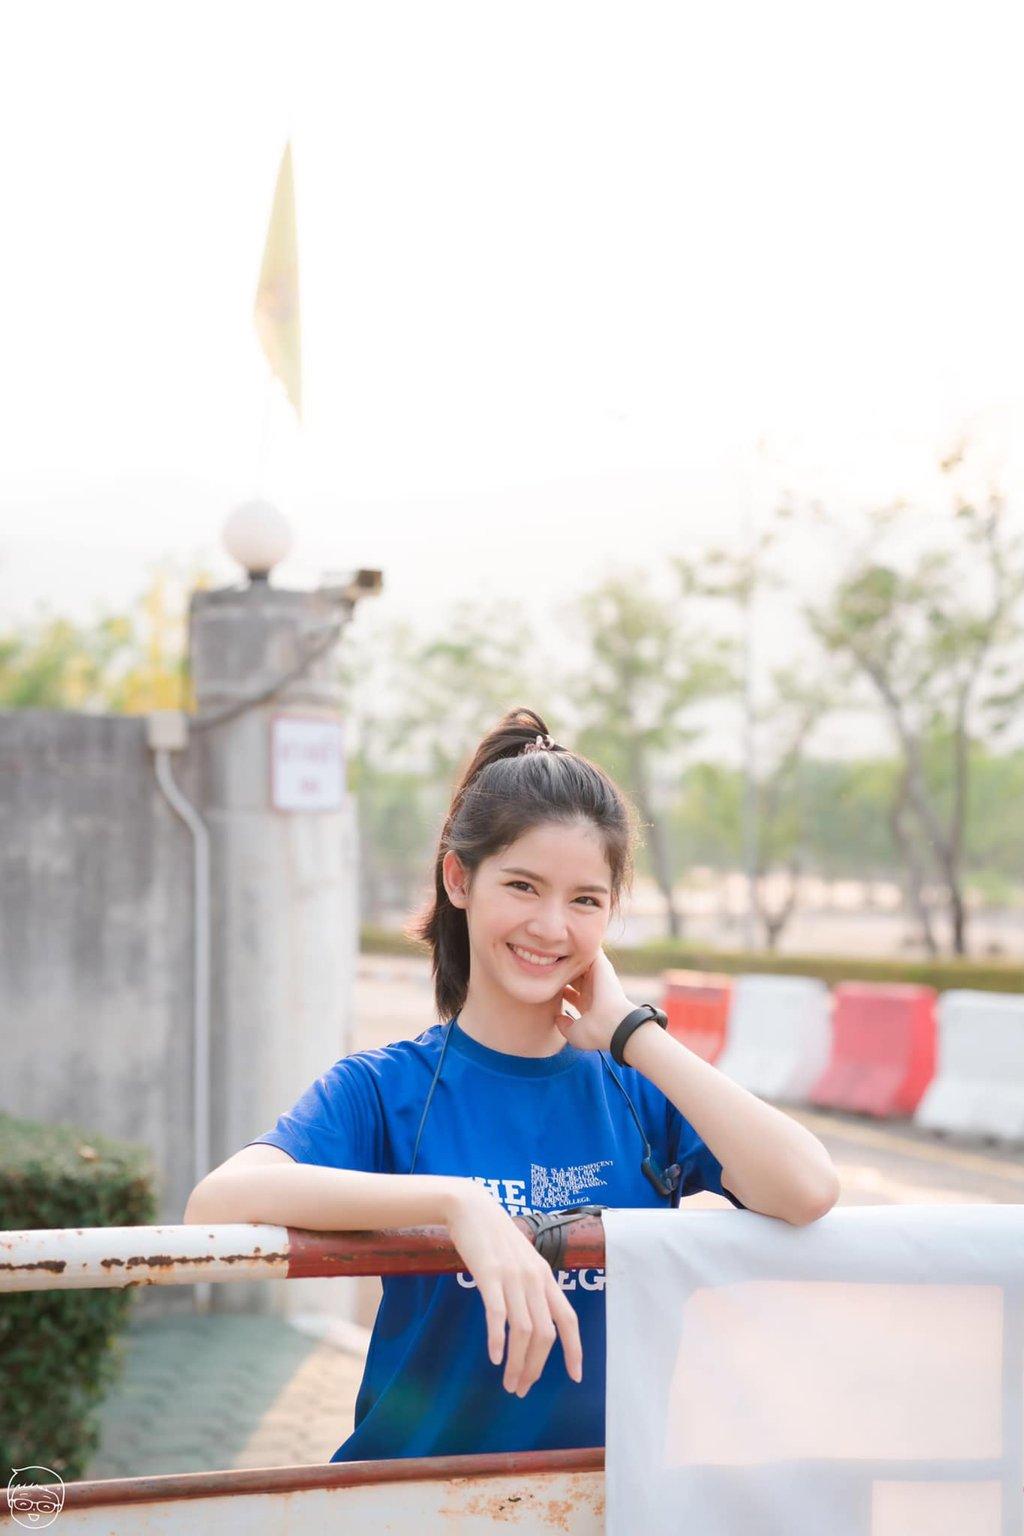 Image Thailand Model - Nuttacha Chayangkanont - Fun & Run - TruePic.net - Picture-4